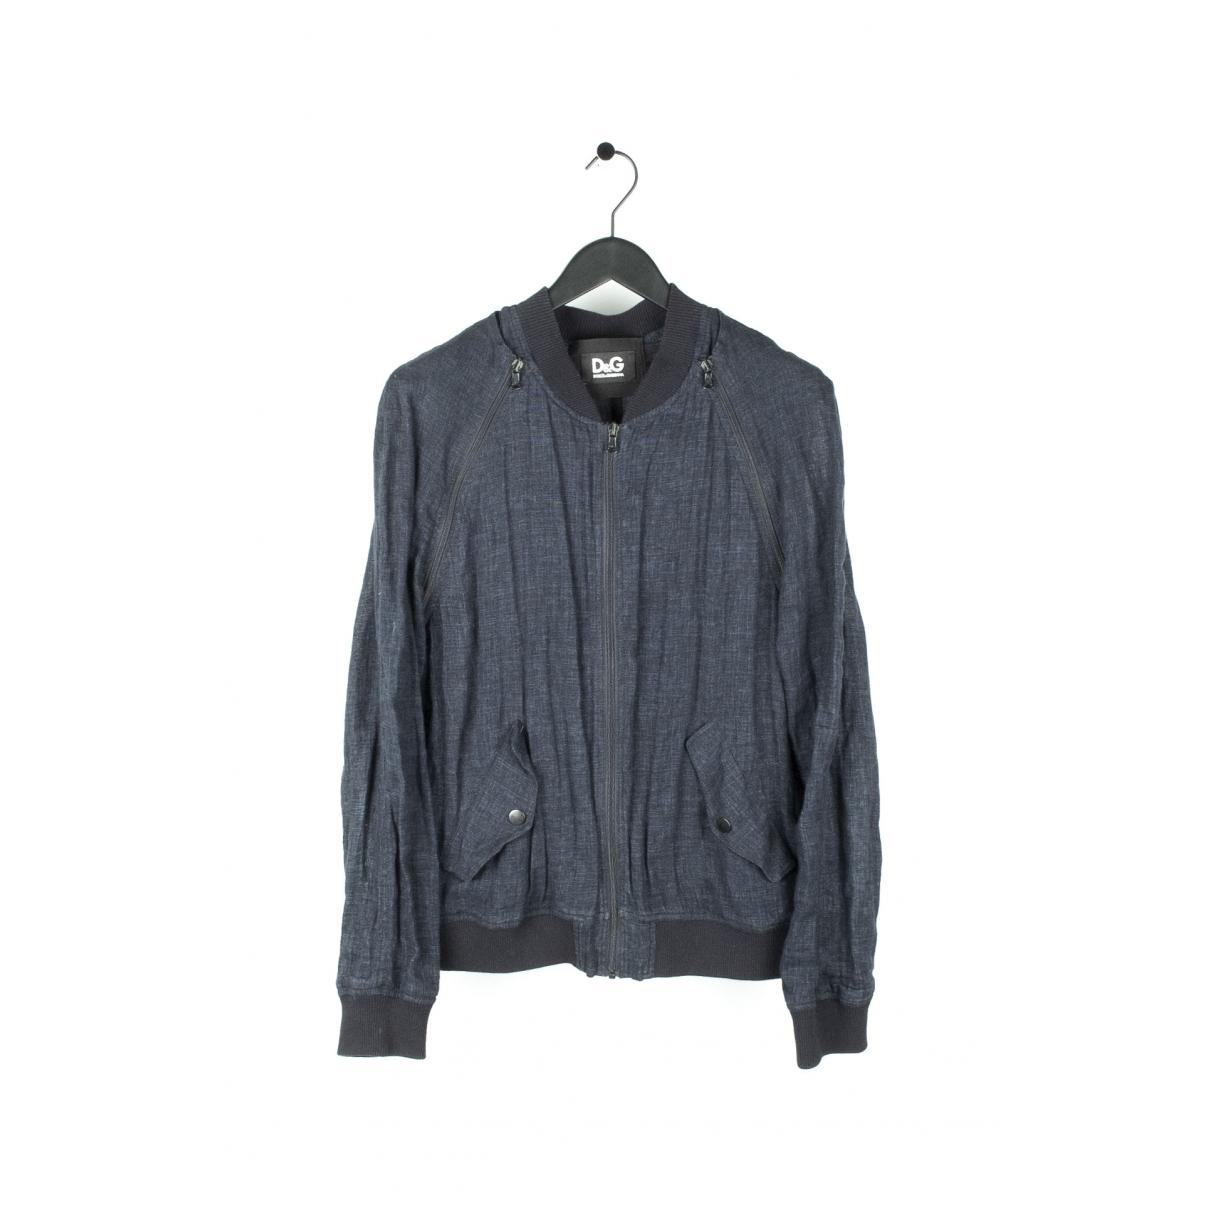 Dolce & Gabbana \N Blue Linen jacket  for Men L International